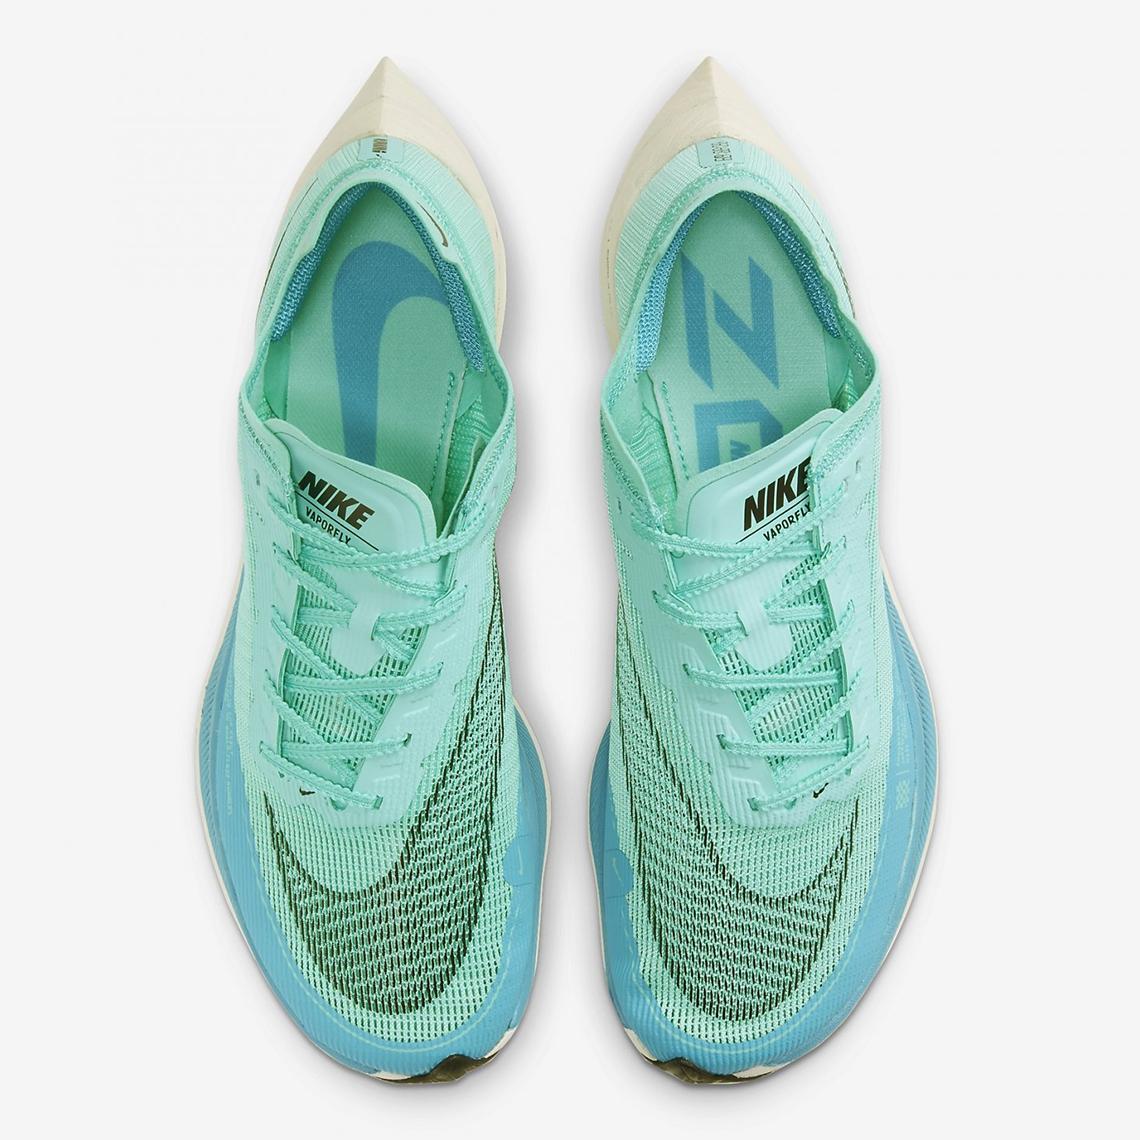 Nike Zoom Vaporfly Next 2 Cu4111 300 Release Date Fitforhealth